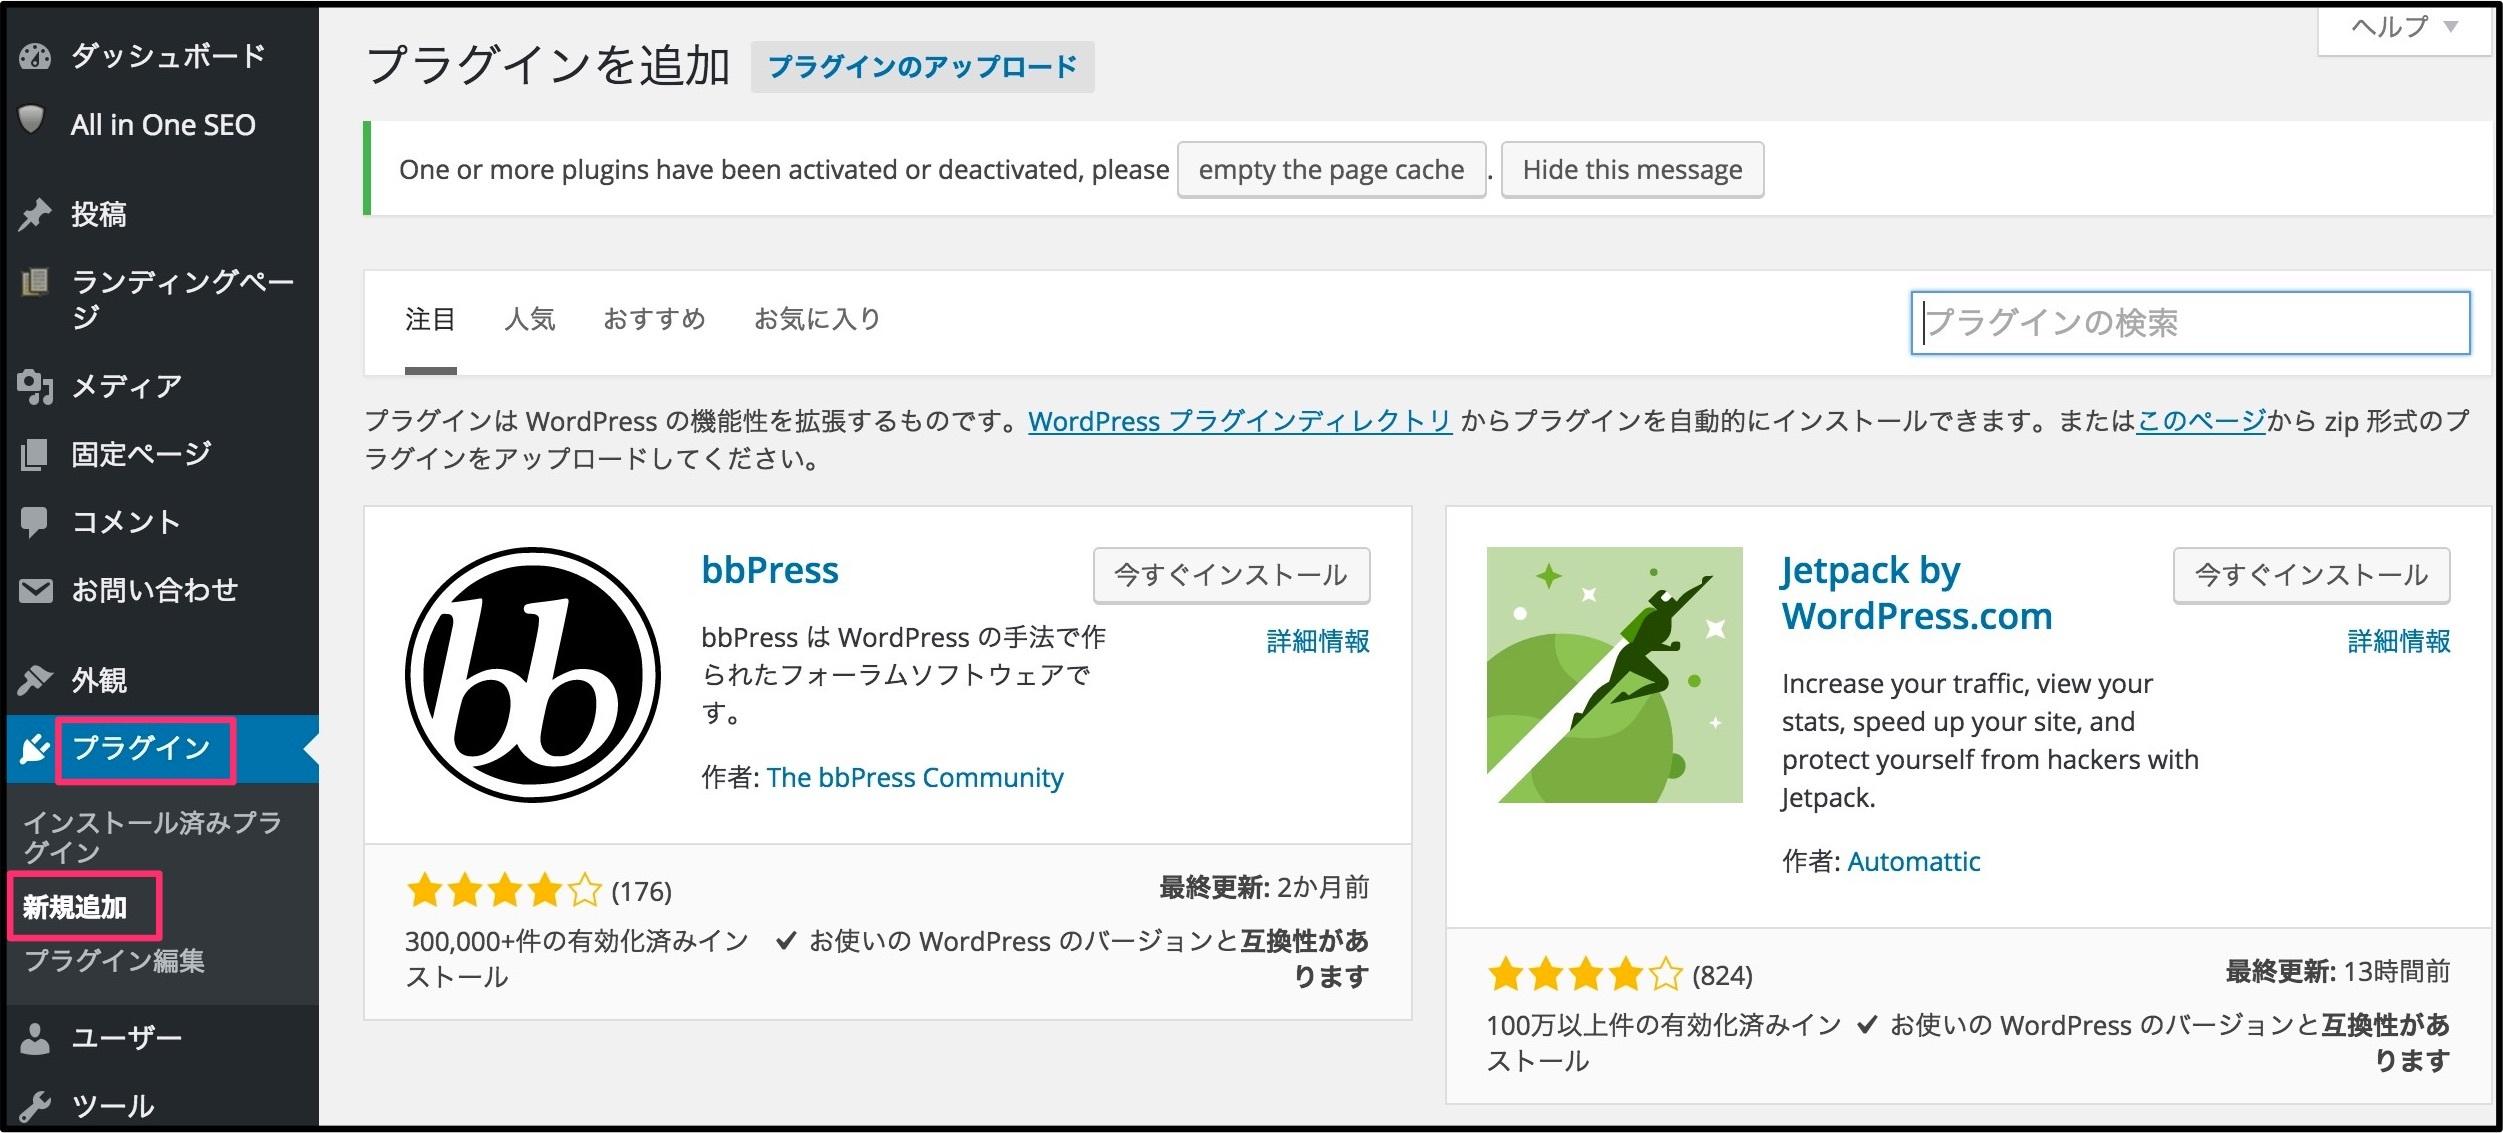 wordpress popular post1